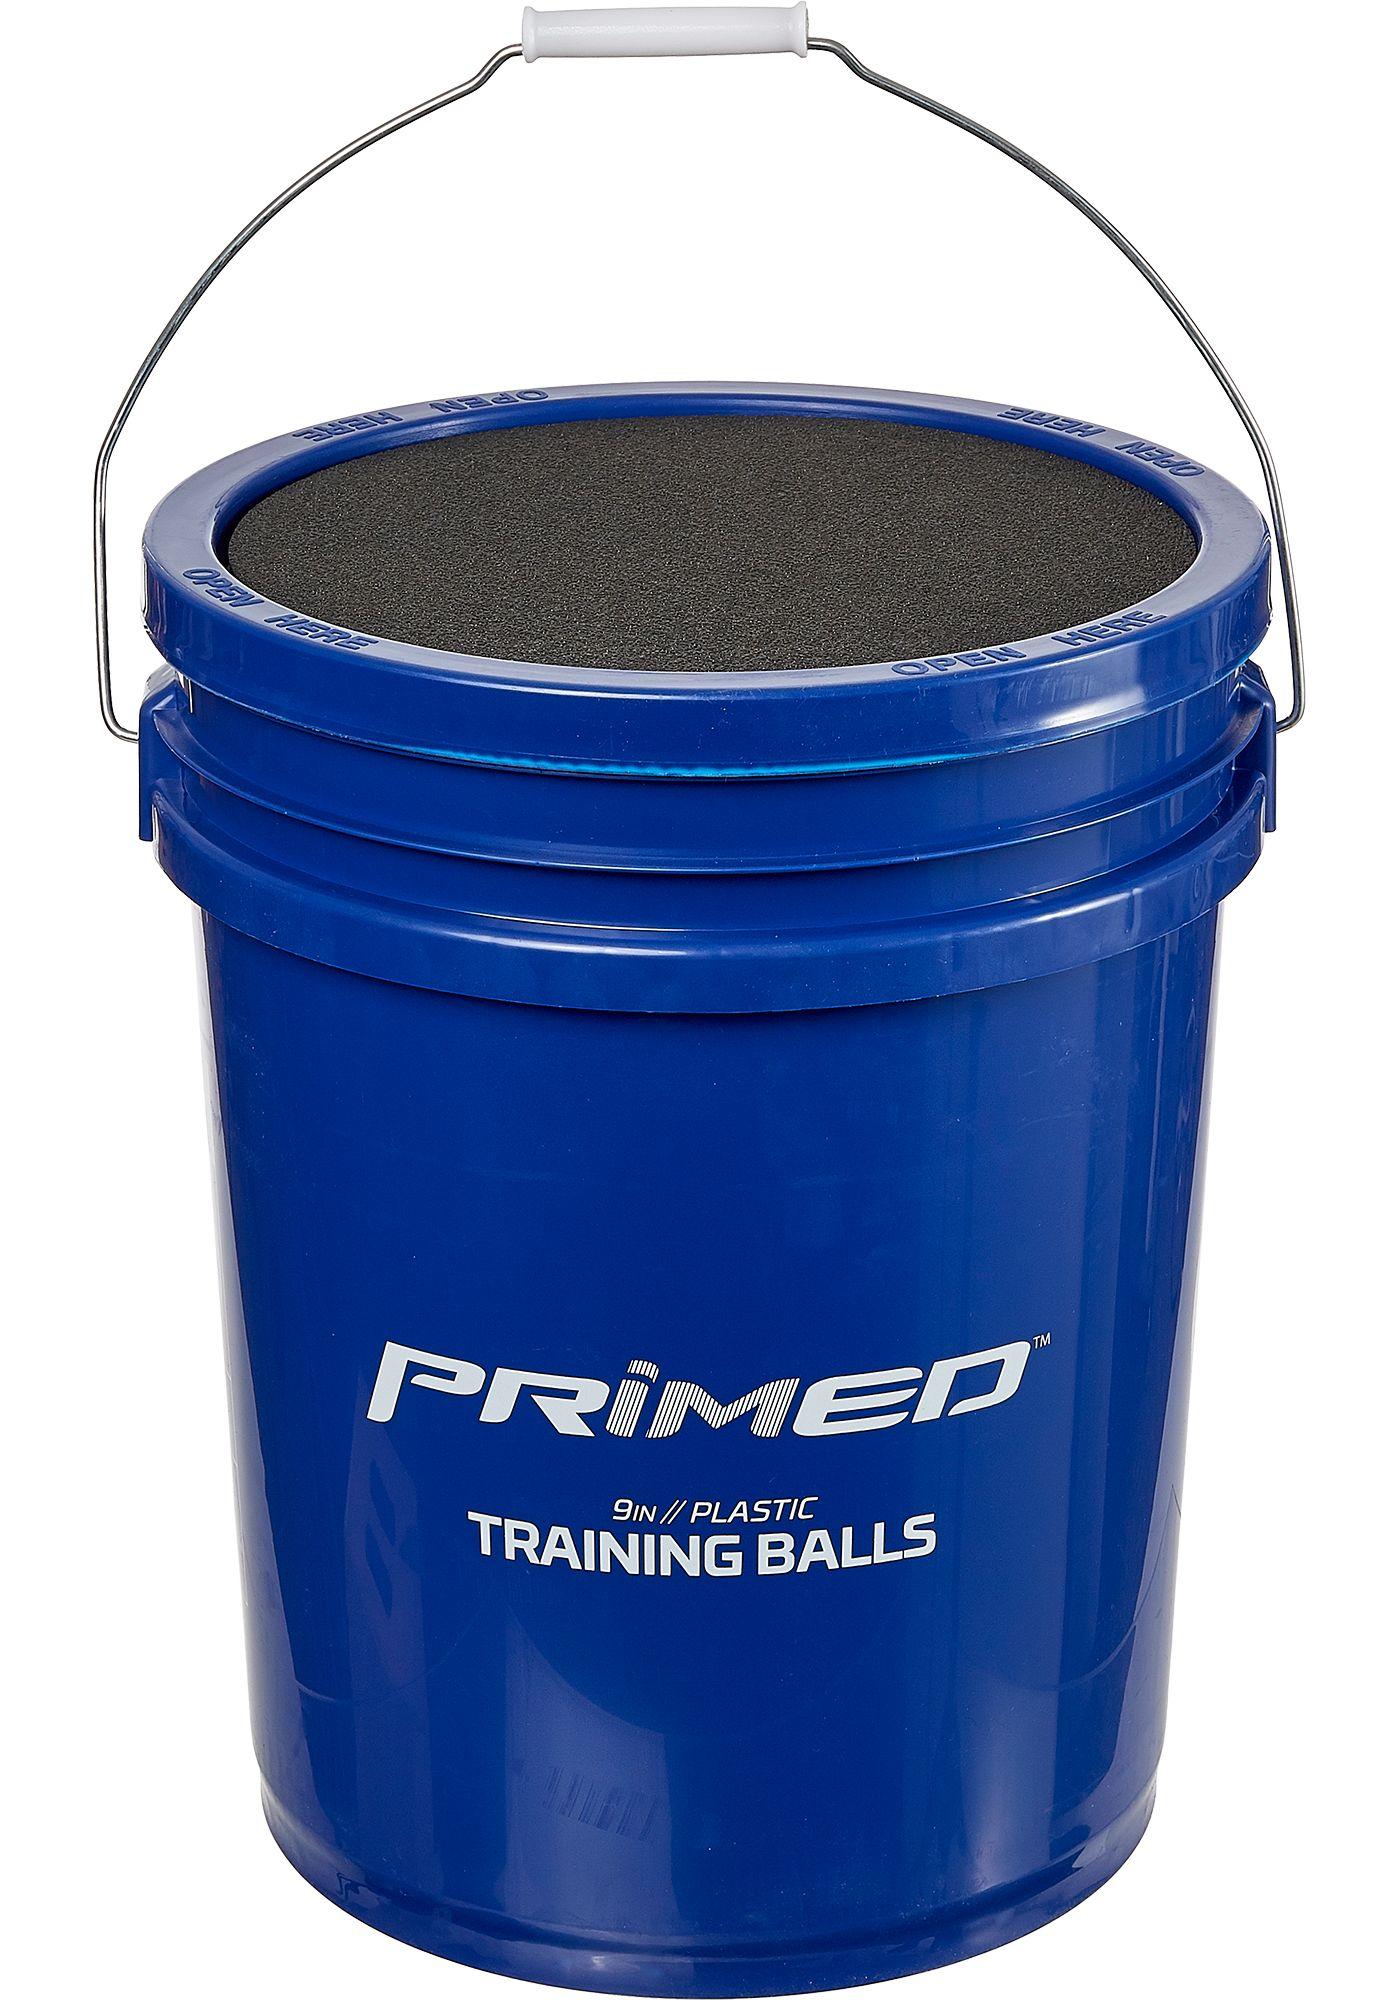 PRIMED Plastic Training Ball Bucket - 48 Pack